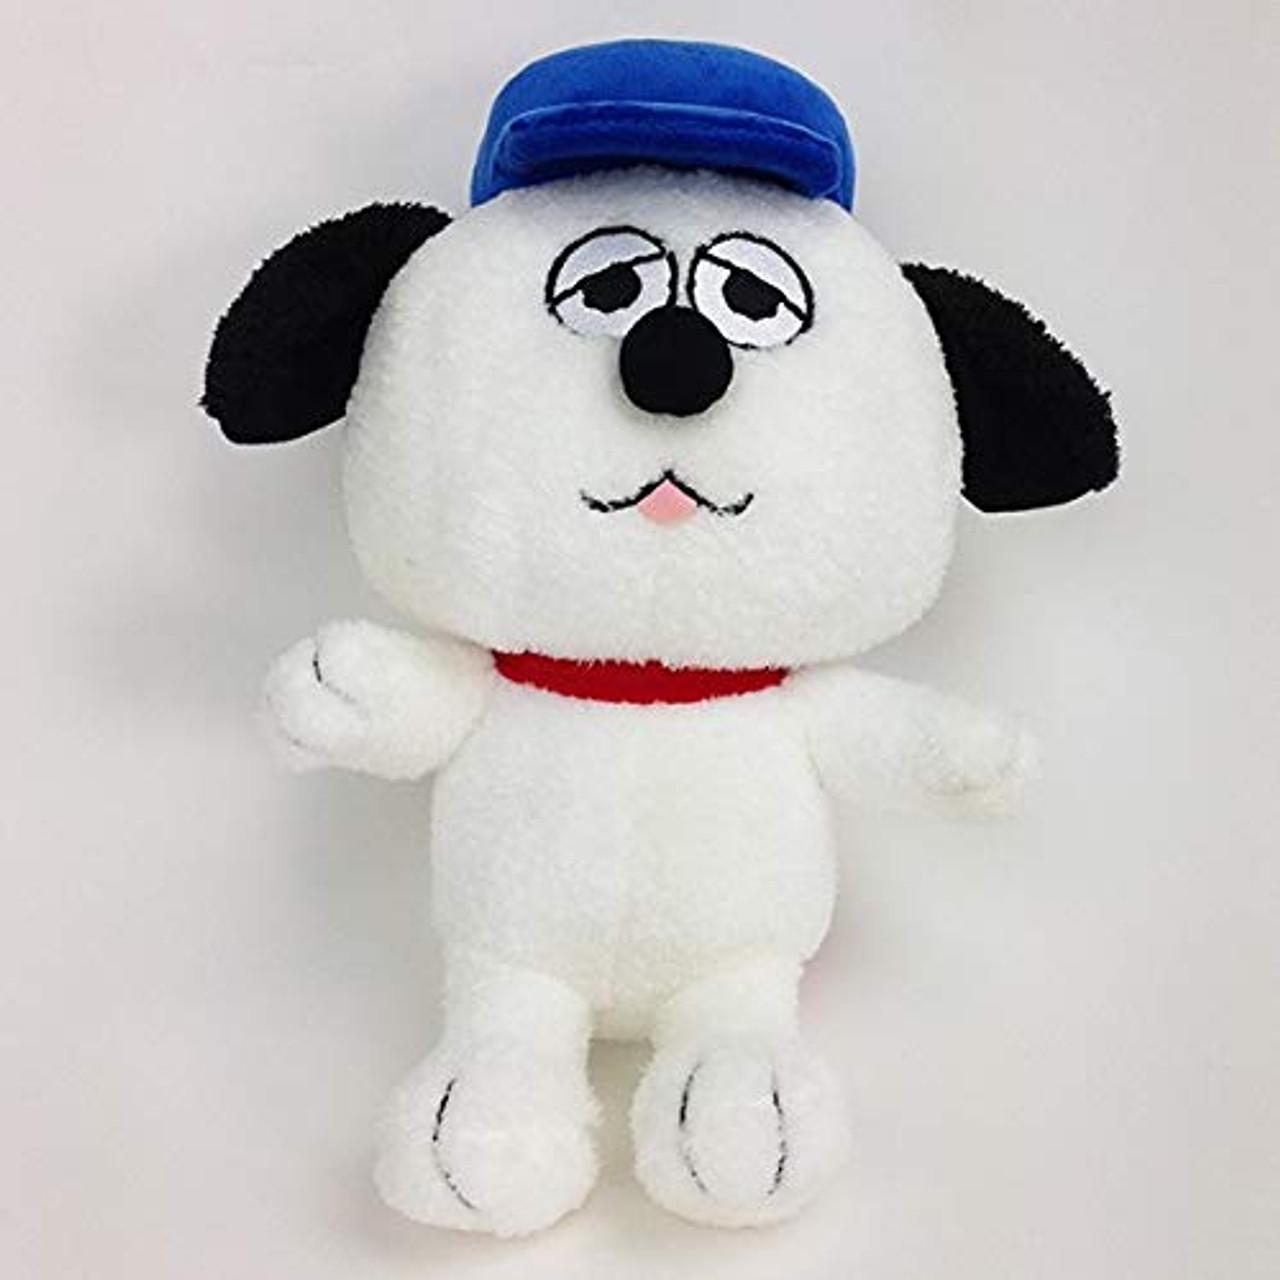 Nakajima Corporation Plush Doll Hug Hug Snoopy S Olaf TJN